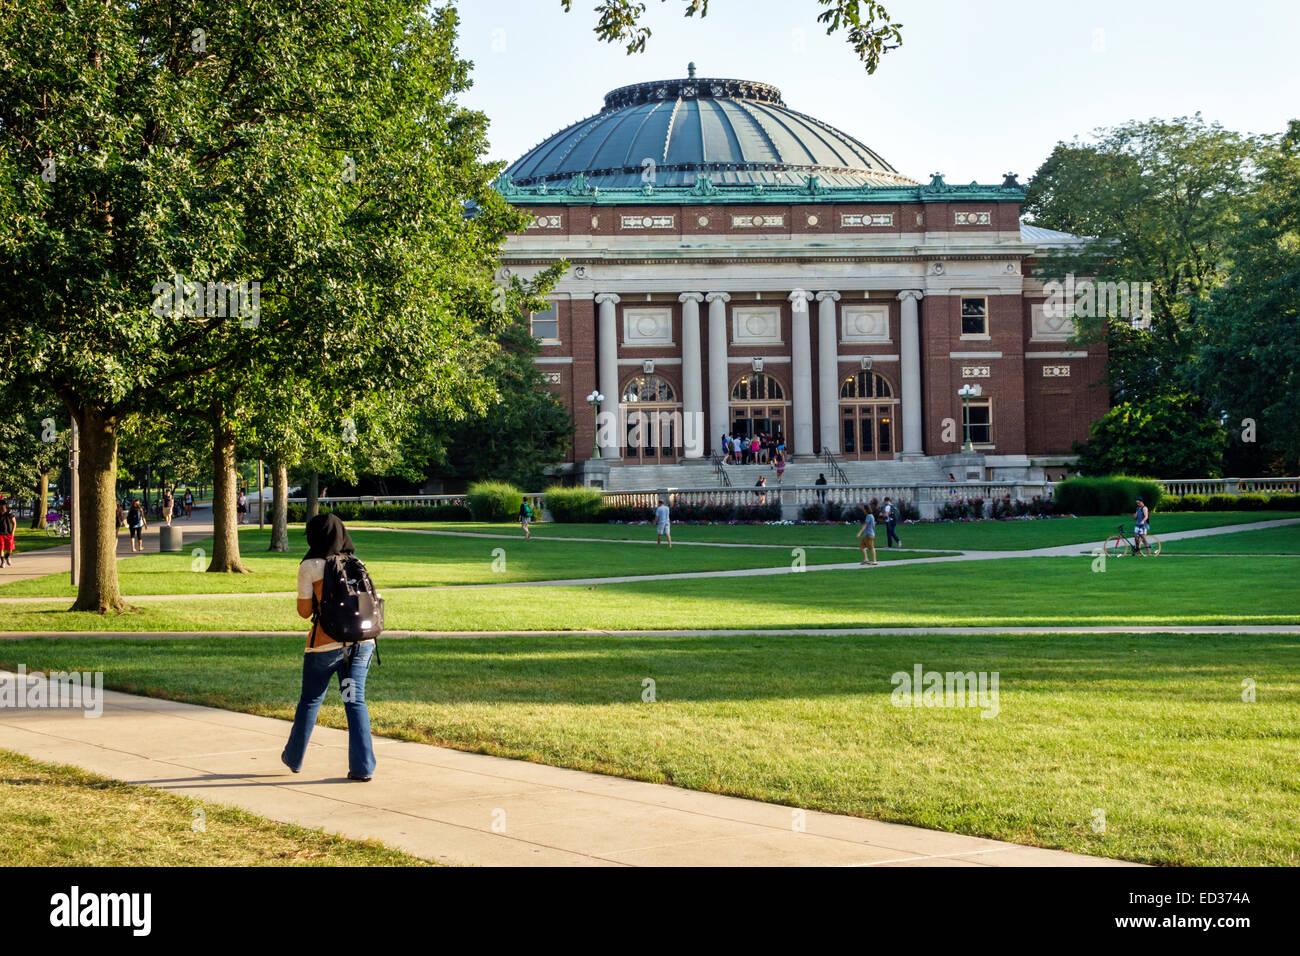 Illinois Urbana-Champaign University of Illinois campus Muslim wearing hijab scarf student woman teen girl Foellinger - Stock Image